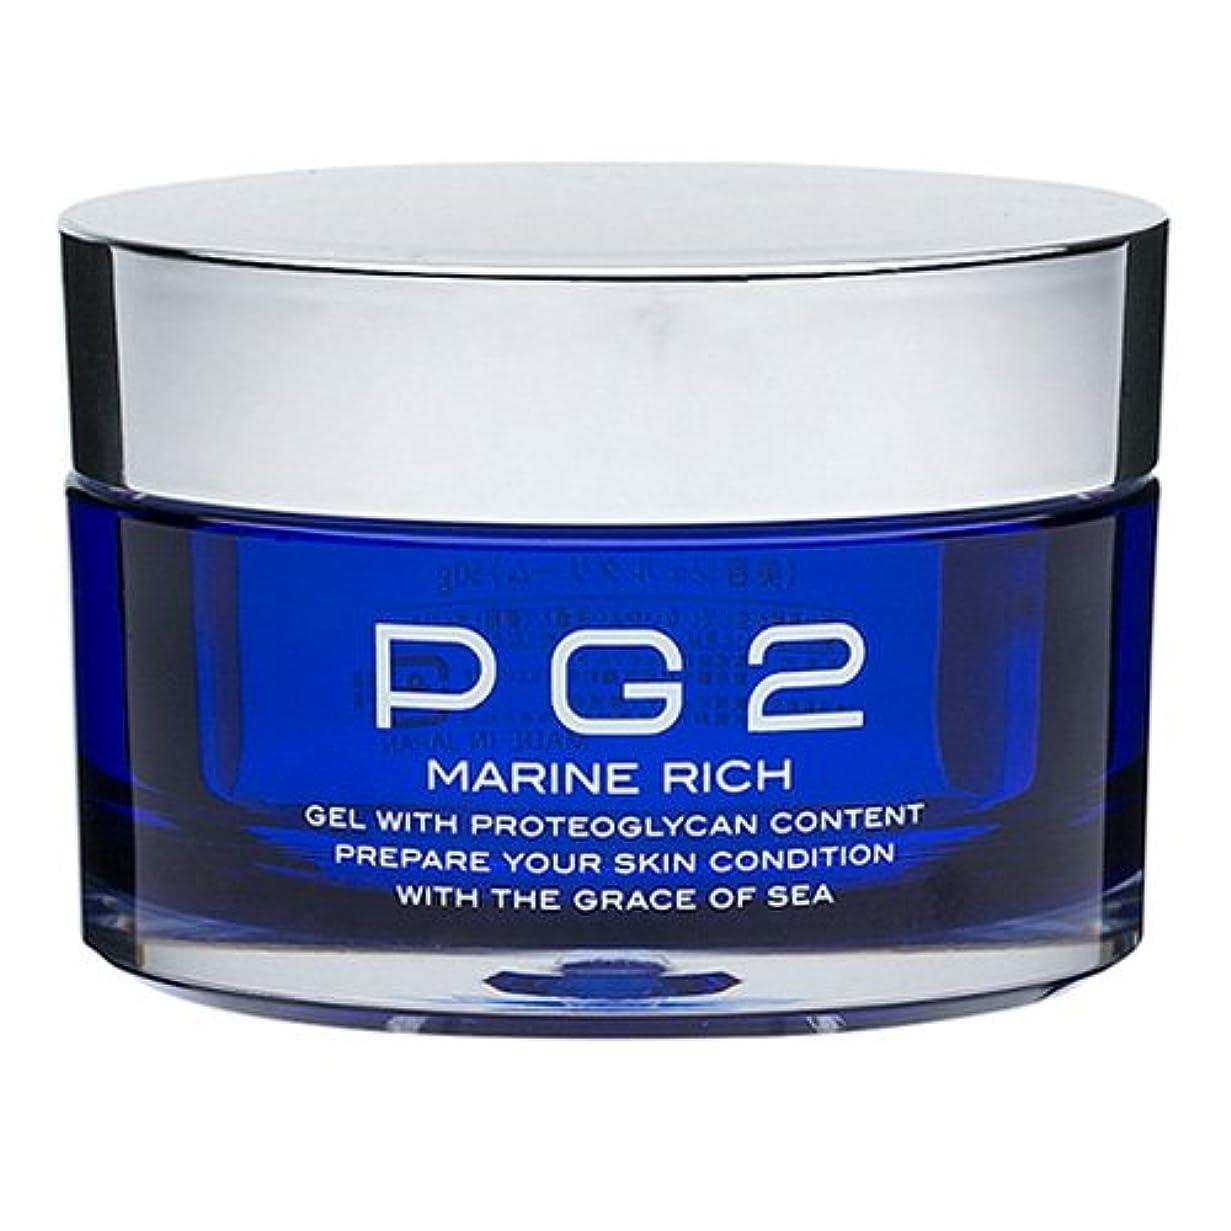 PG2 マリーンリッチ プロテオグリカン配合オールインワン